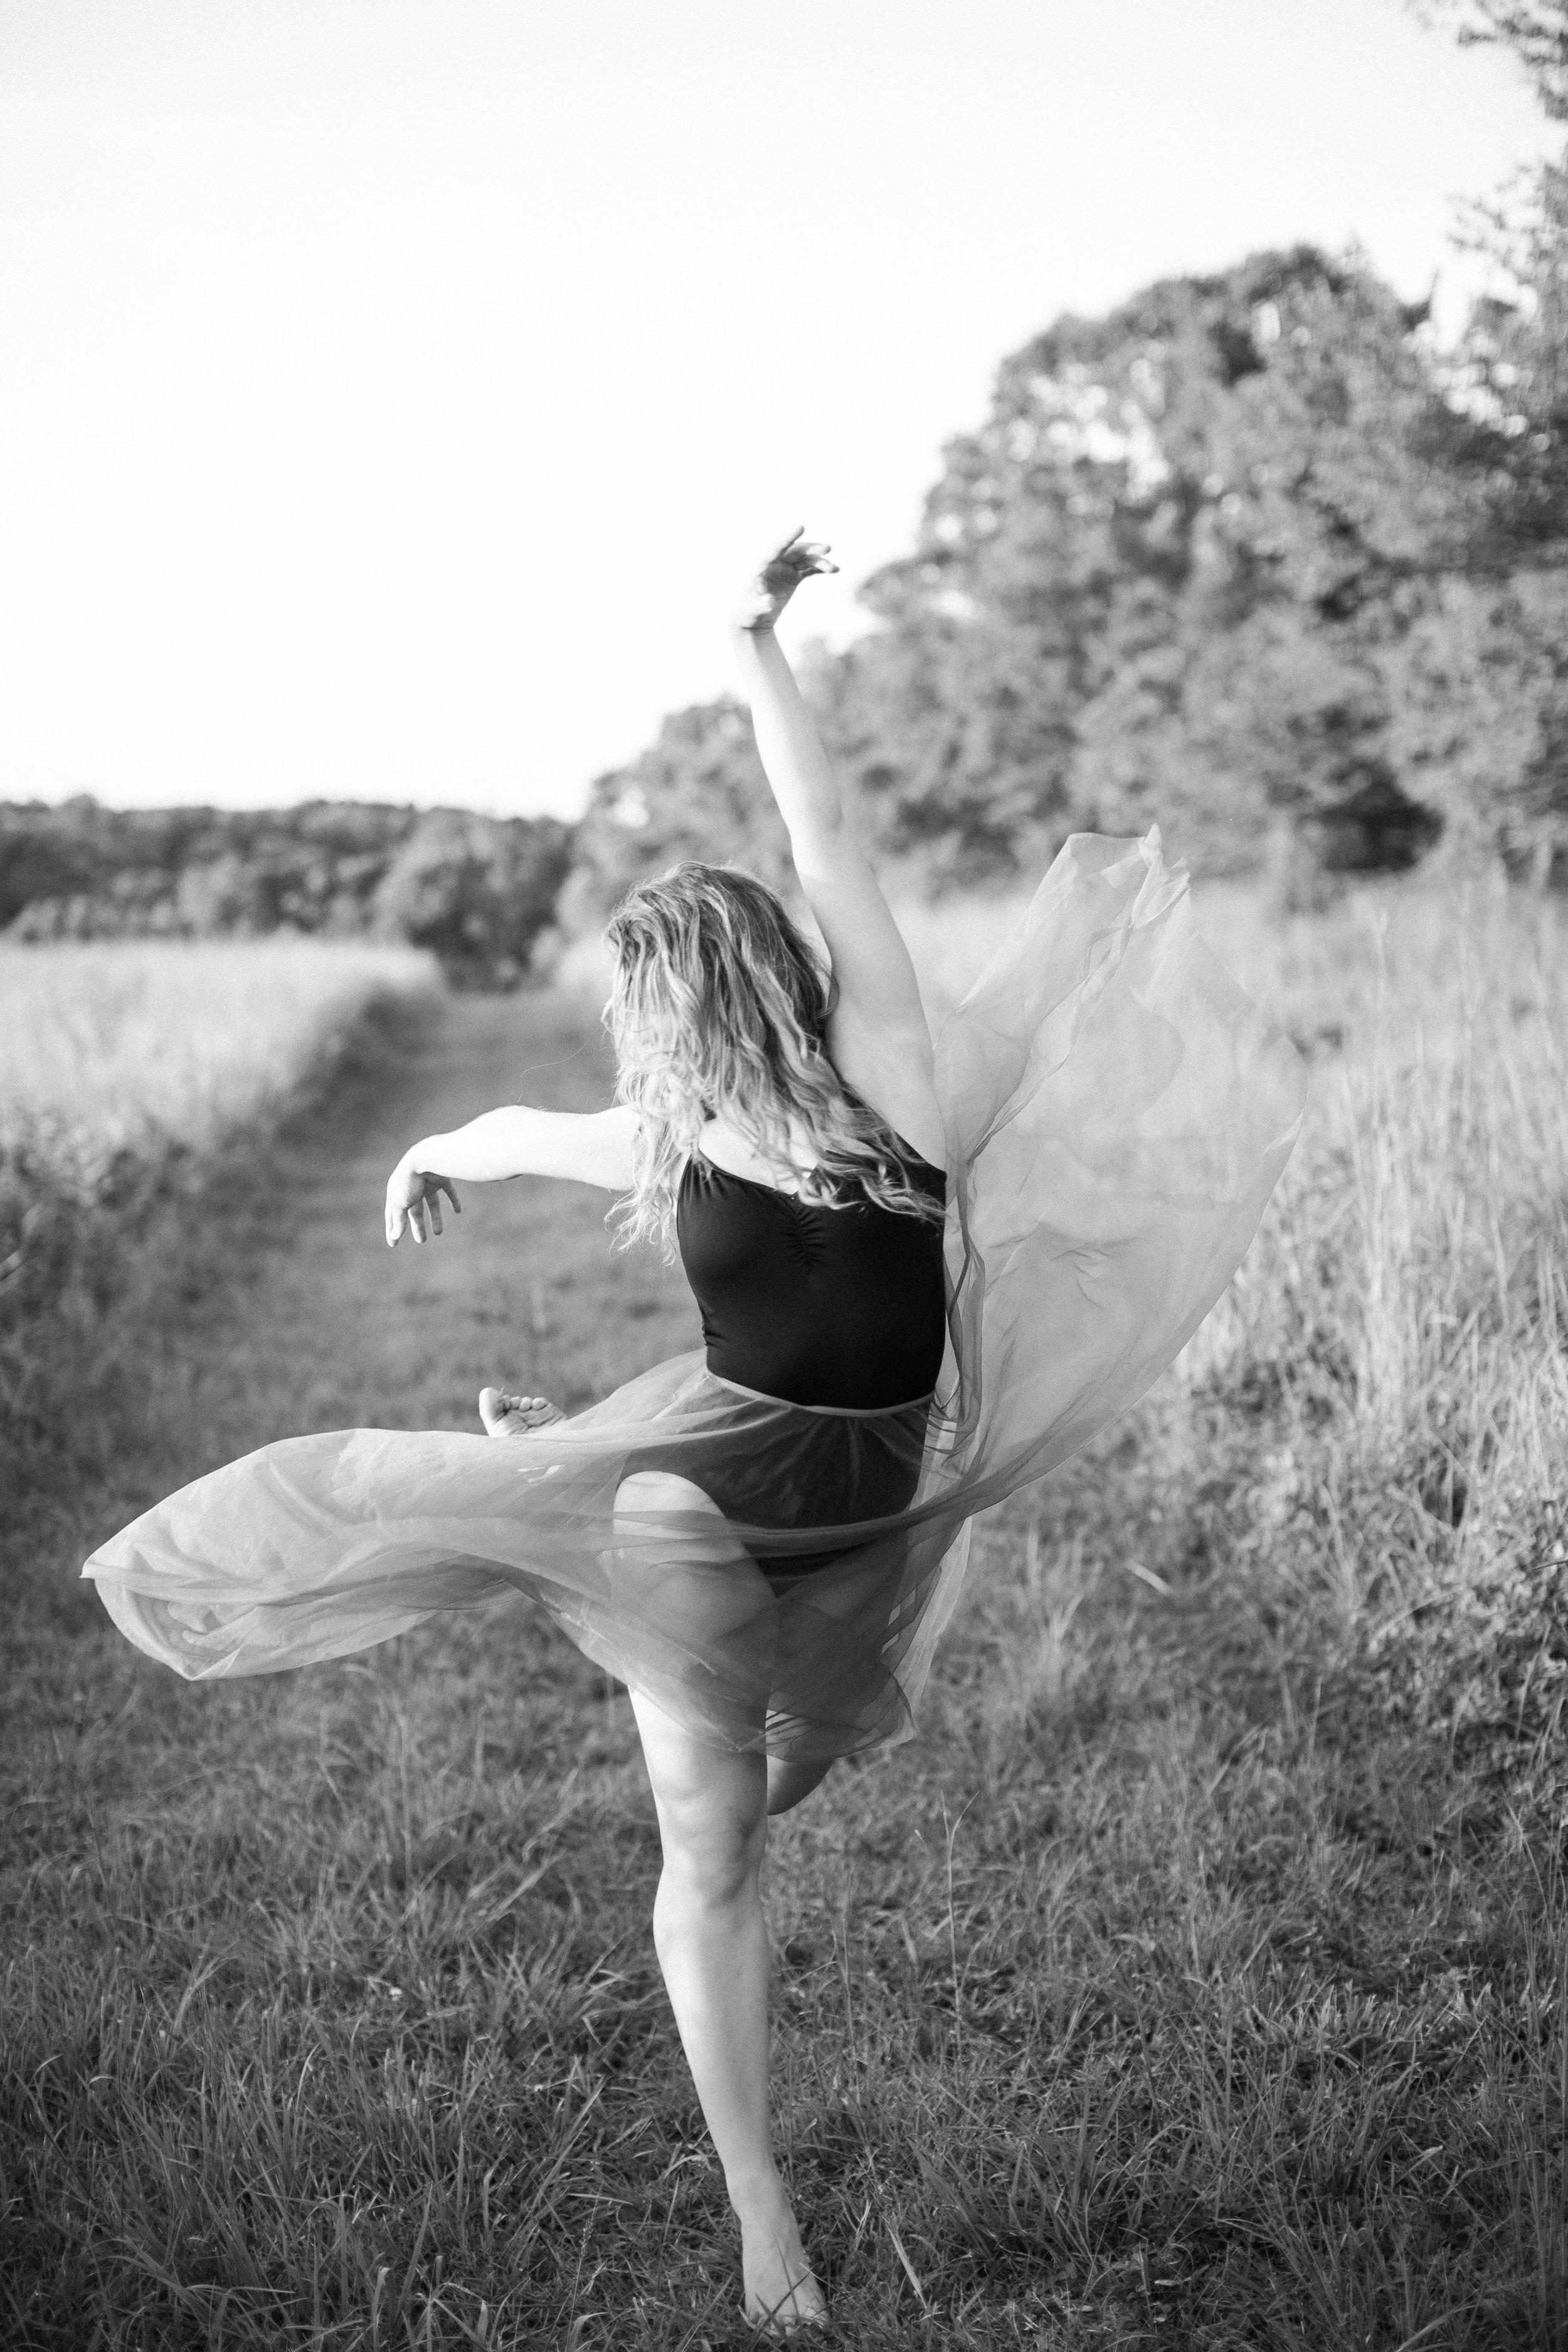 Maddie_Rodrigue_Dancer_NYC_Actor_Headshots_Dance_Lifestyle_